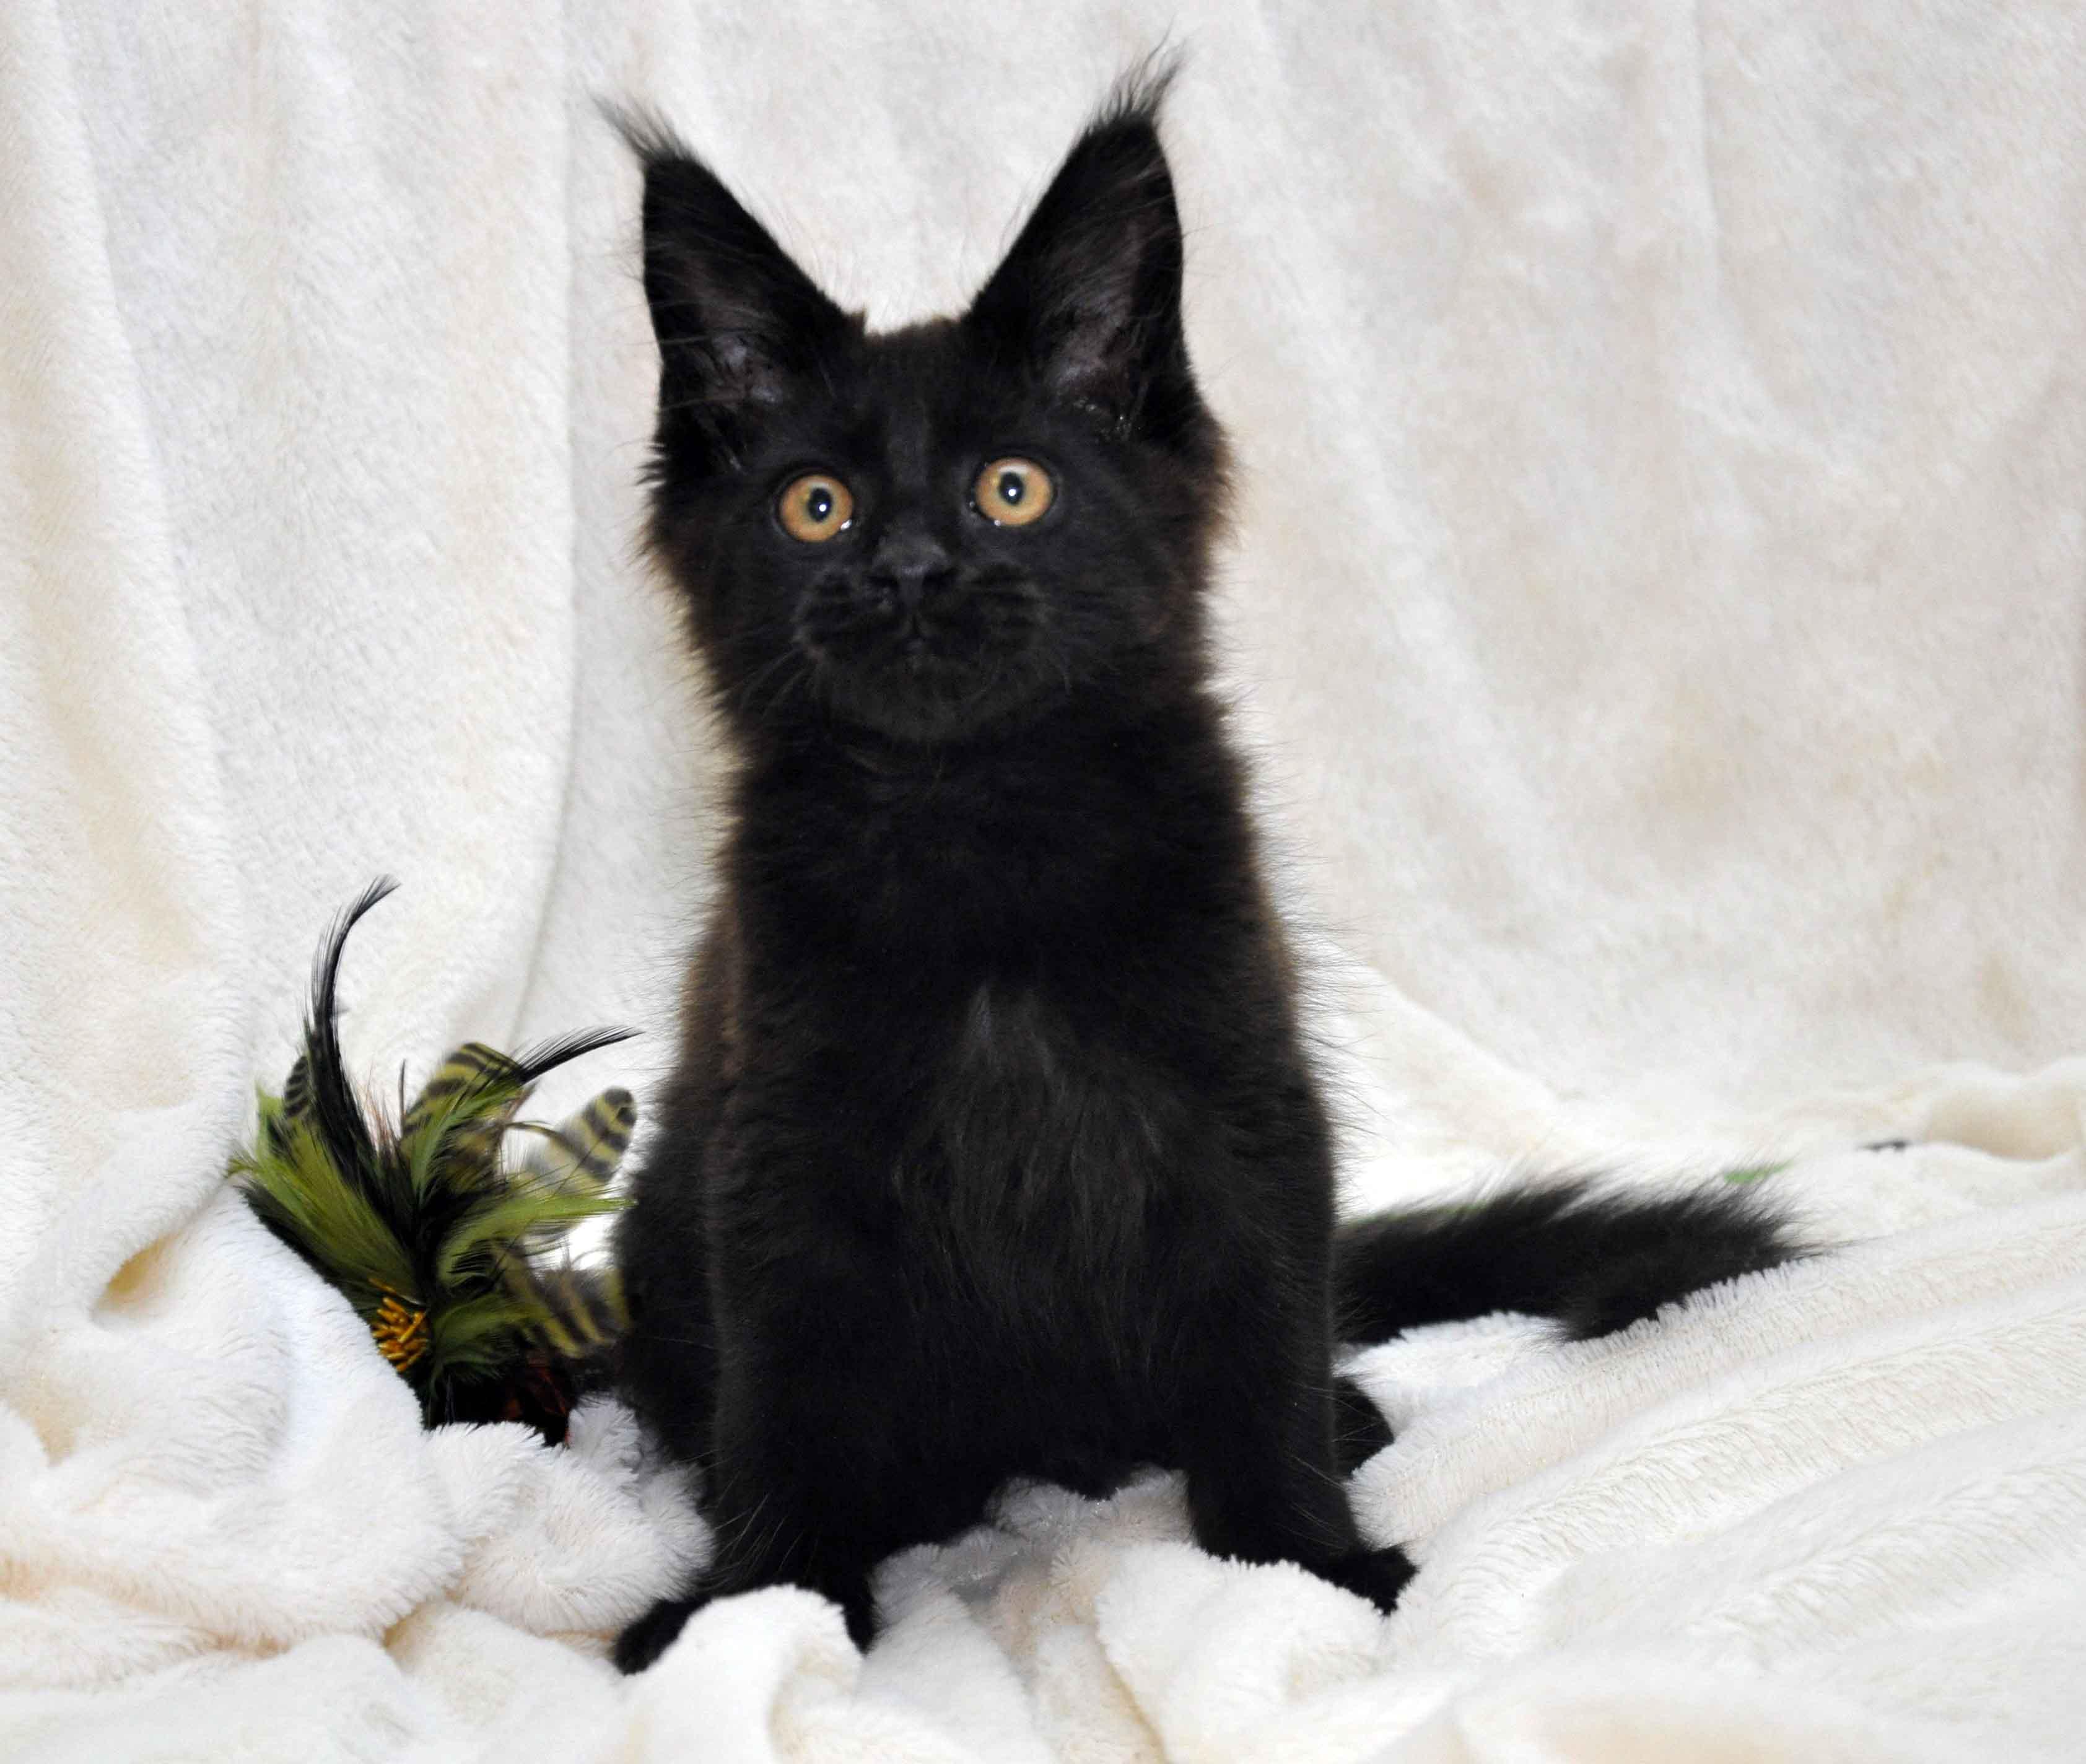 Кот мейн кун JULIOPOLIS возраст 3.5 месяца фото10